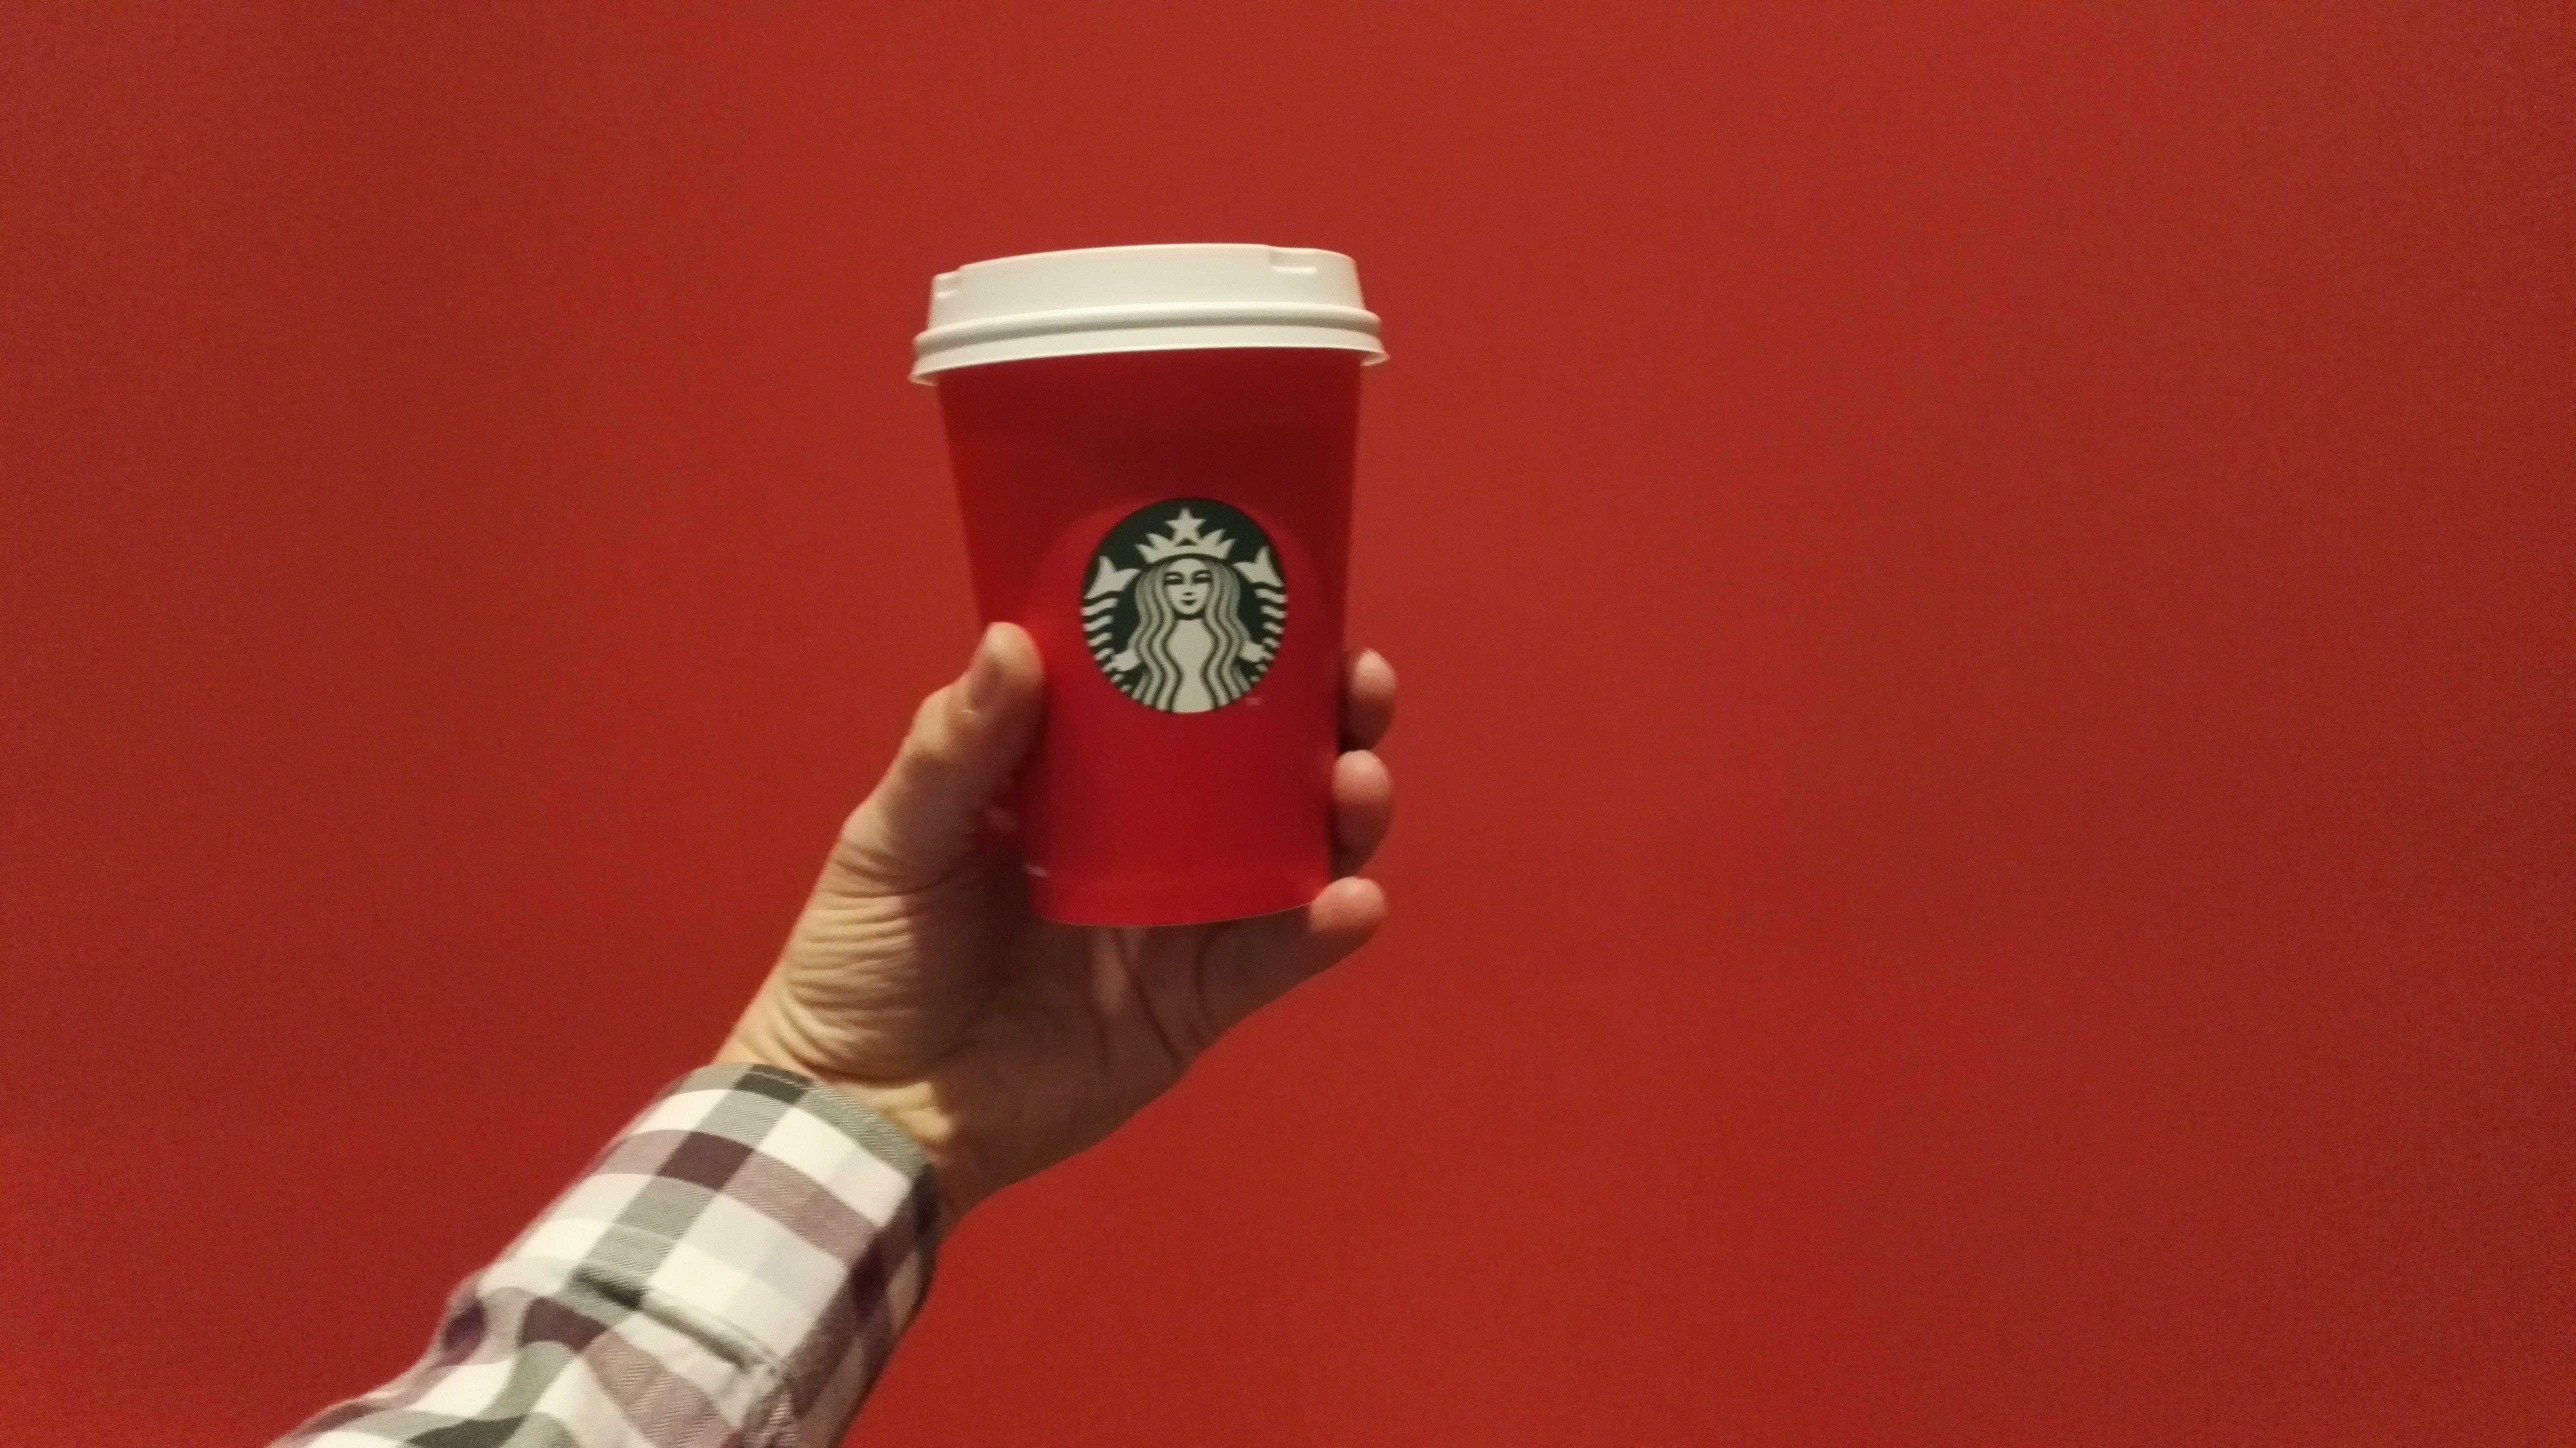 кофе, кофейная чашка, чашка